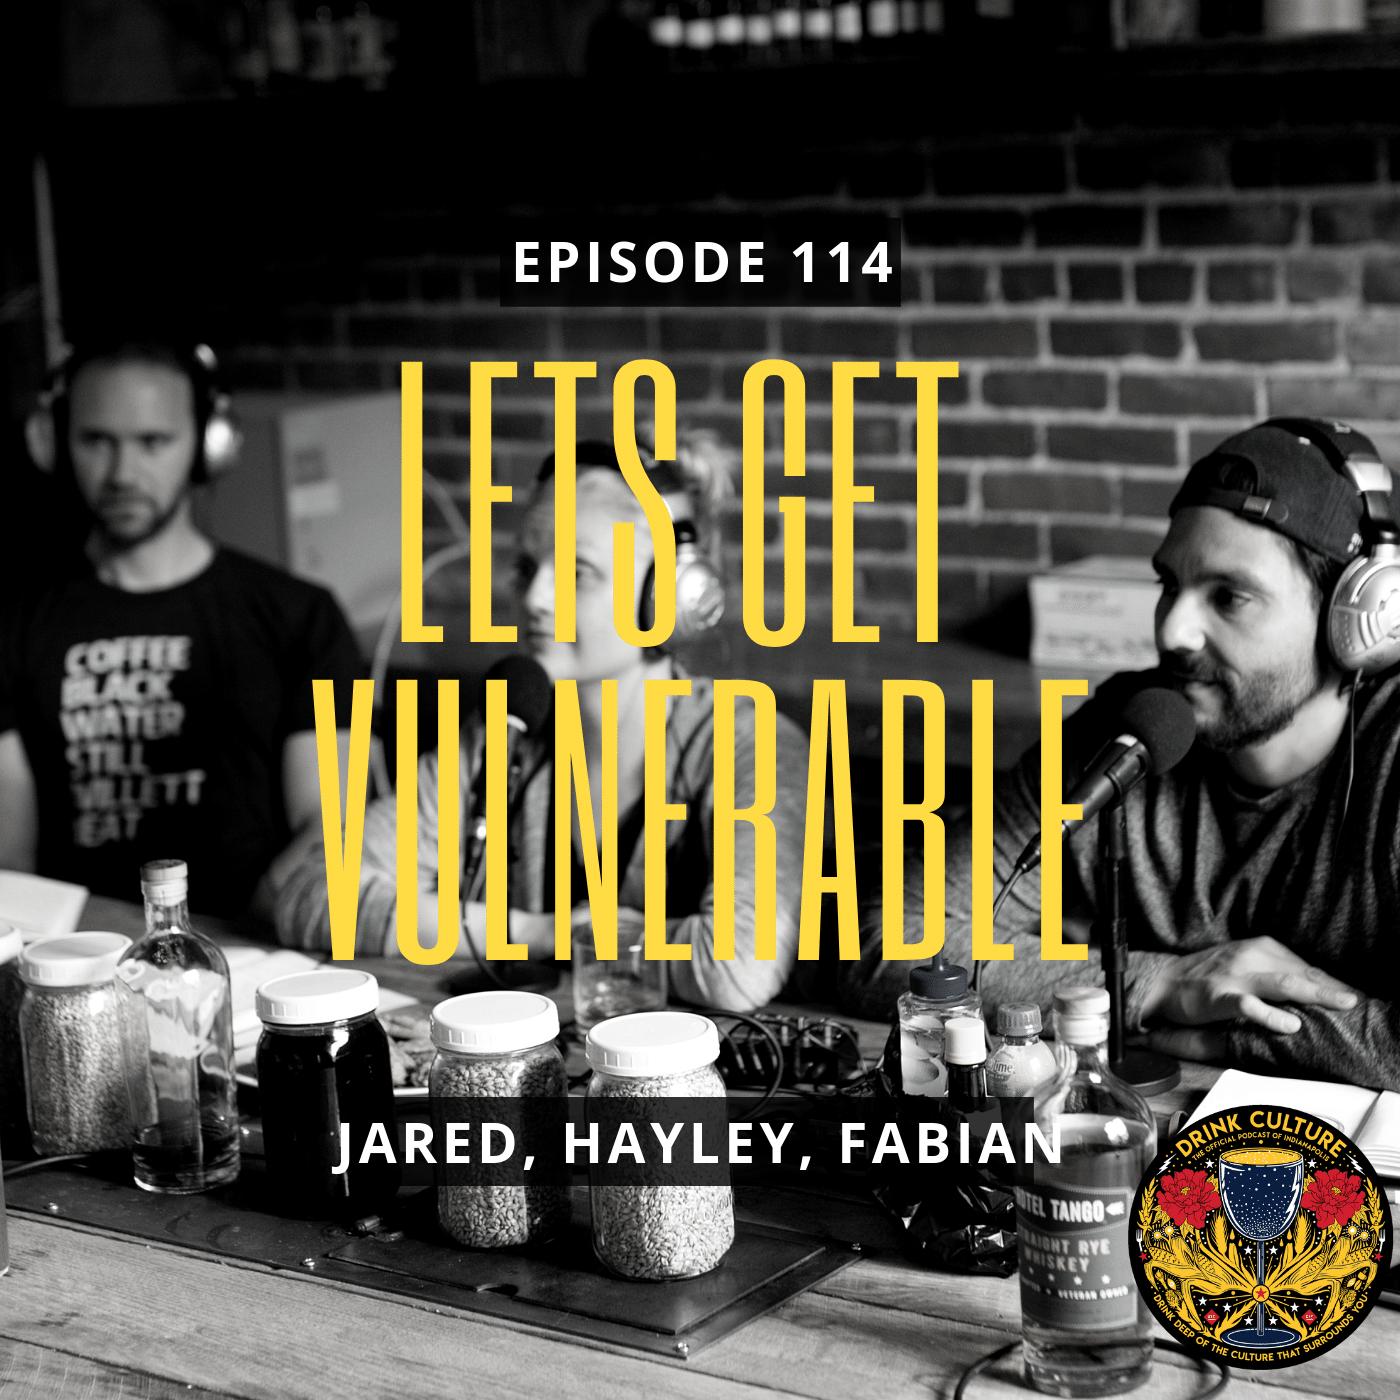 Episode 114: Vulnerability -